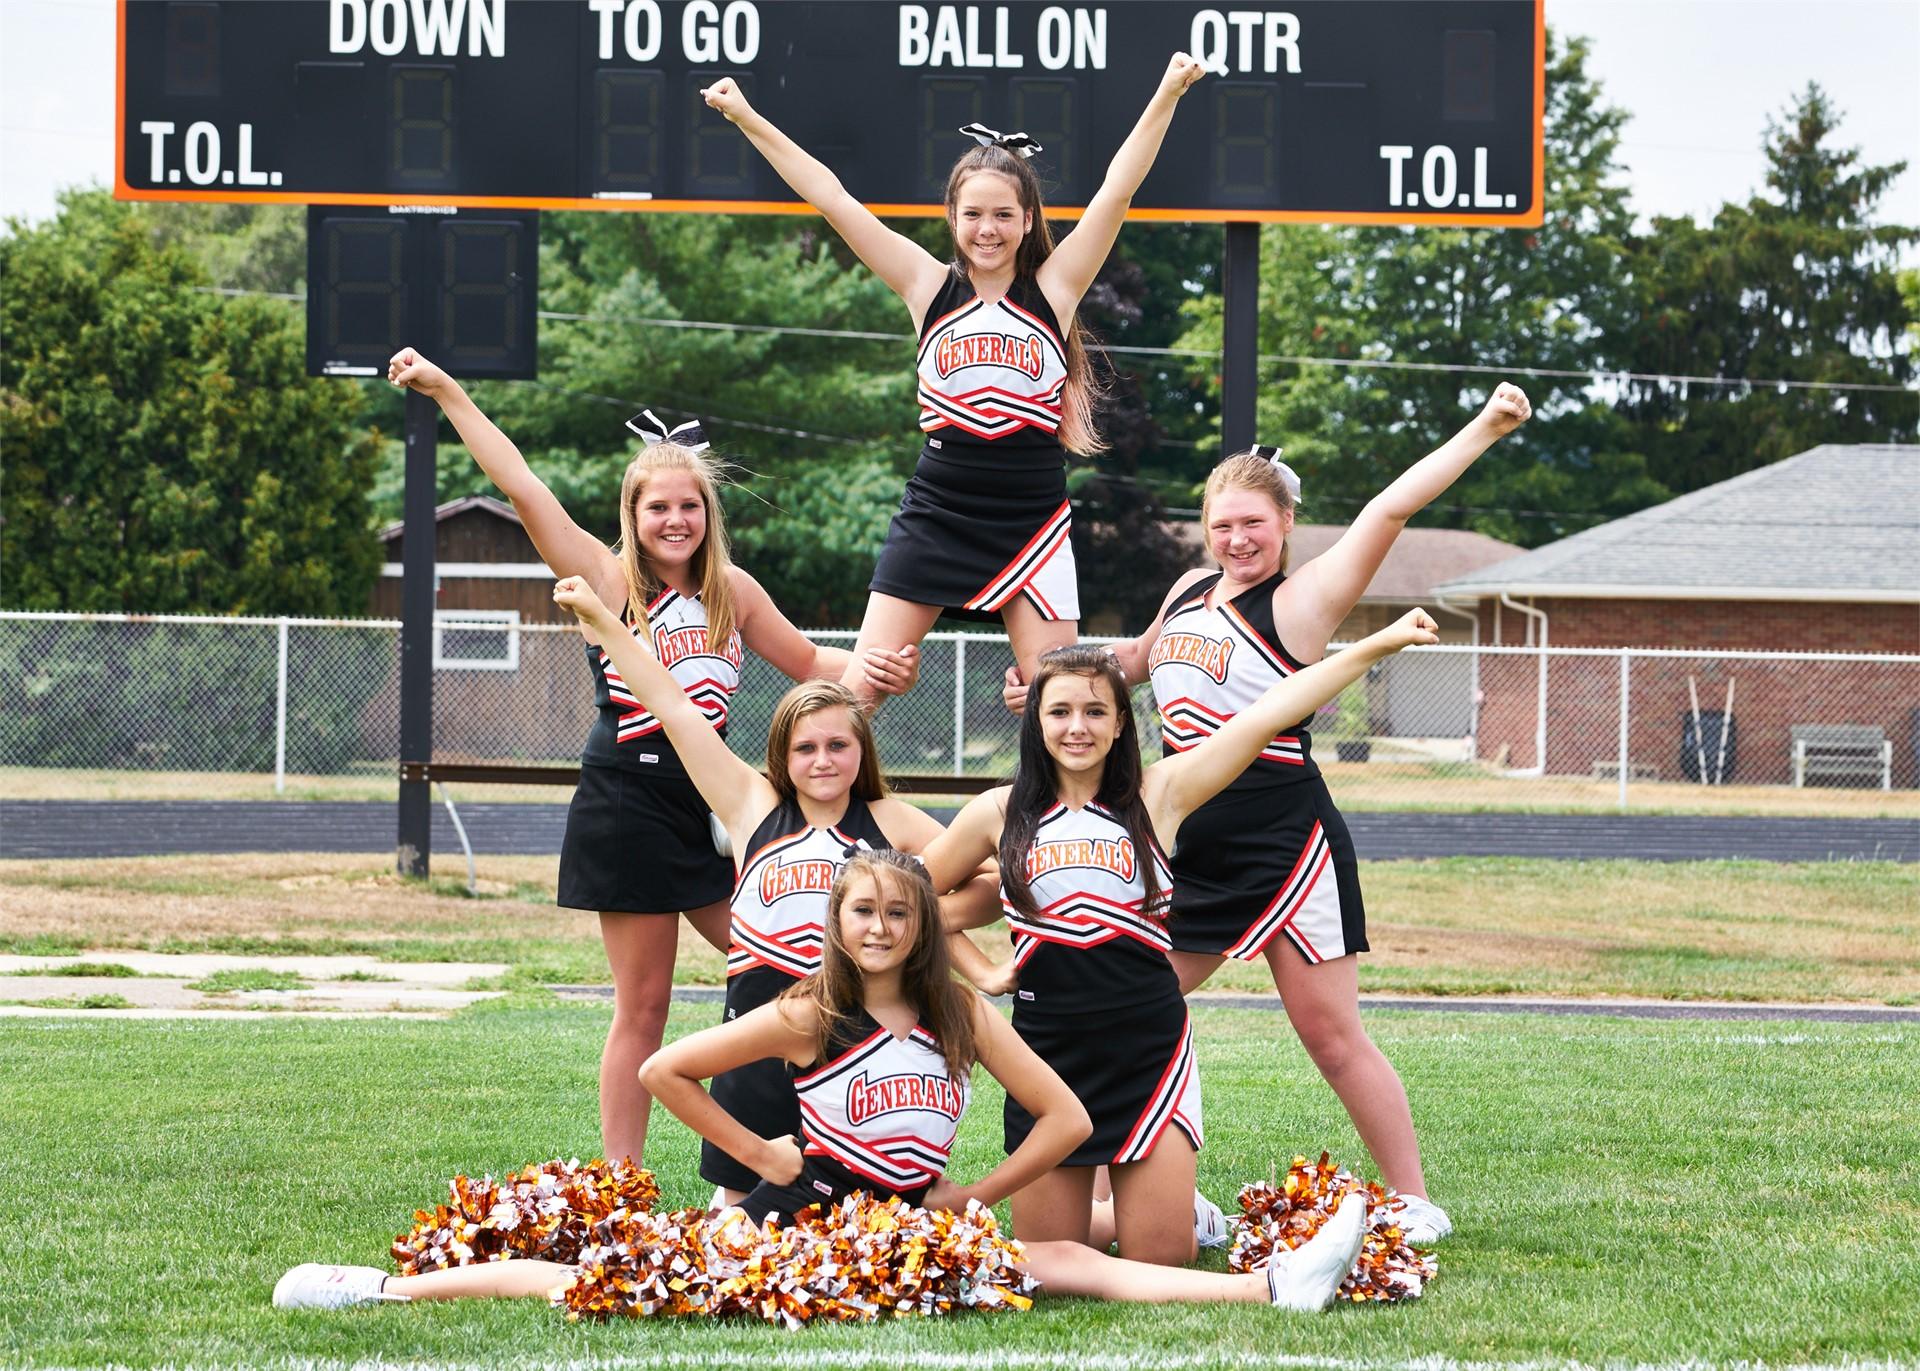 2016-17 8th Grade Cheerleaders